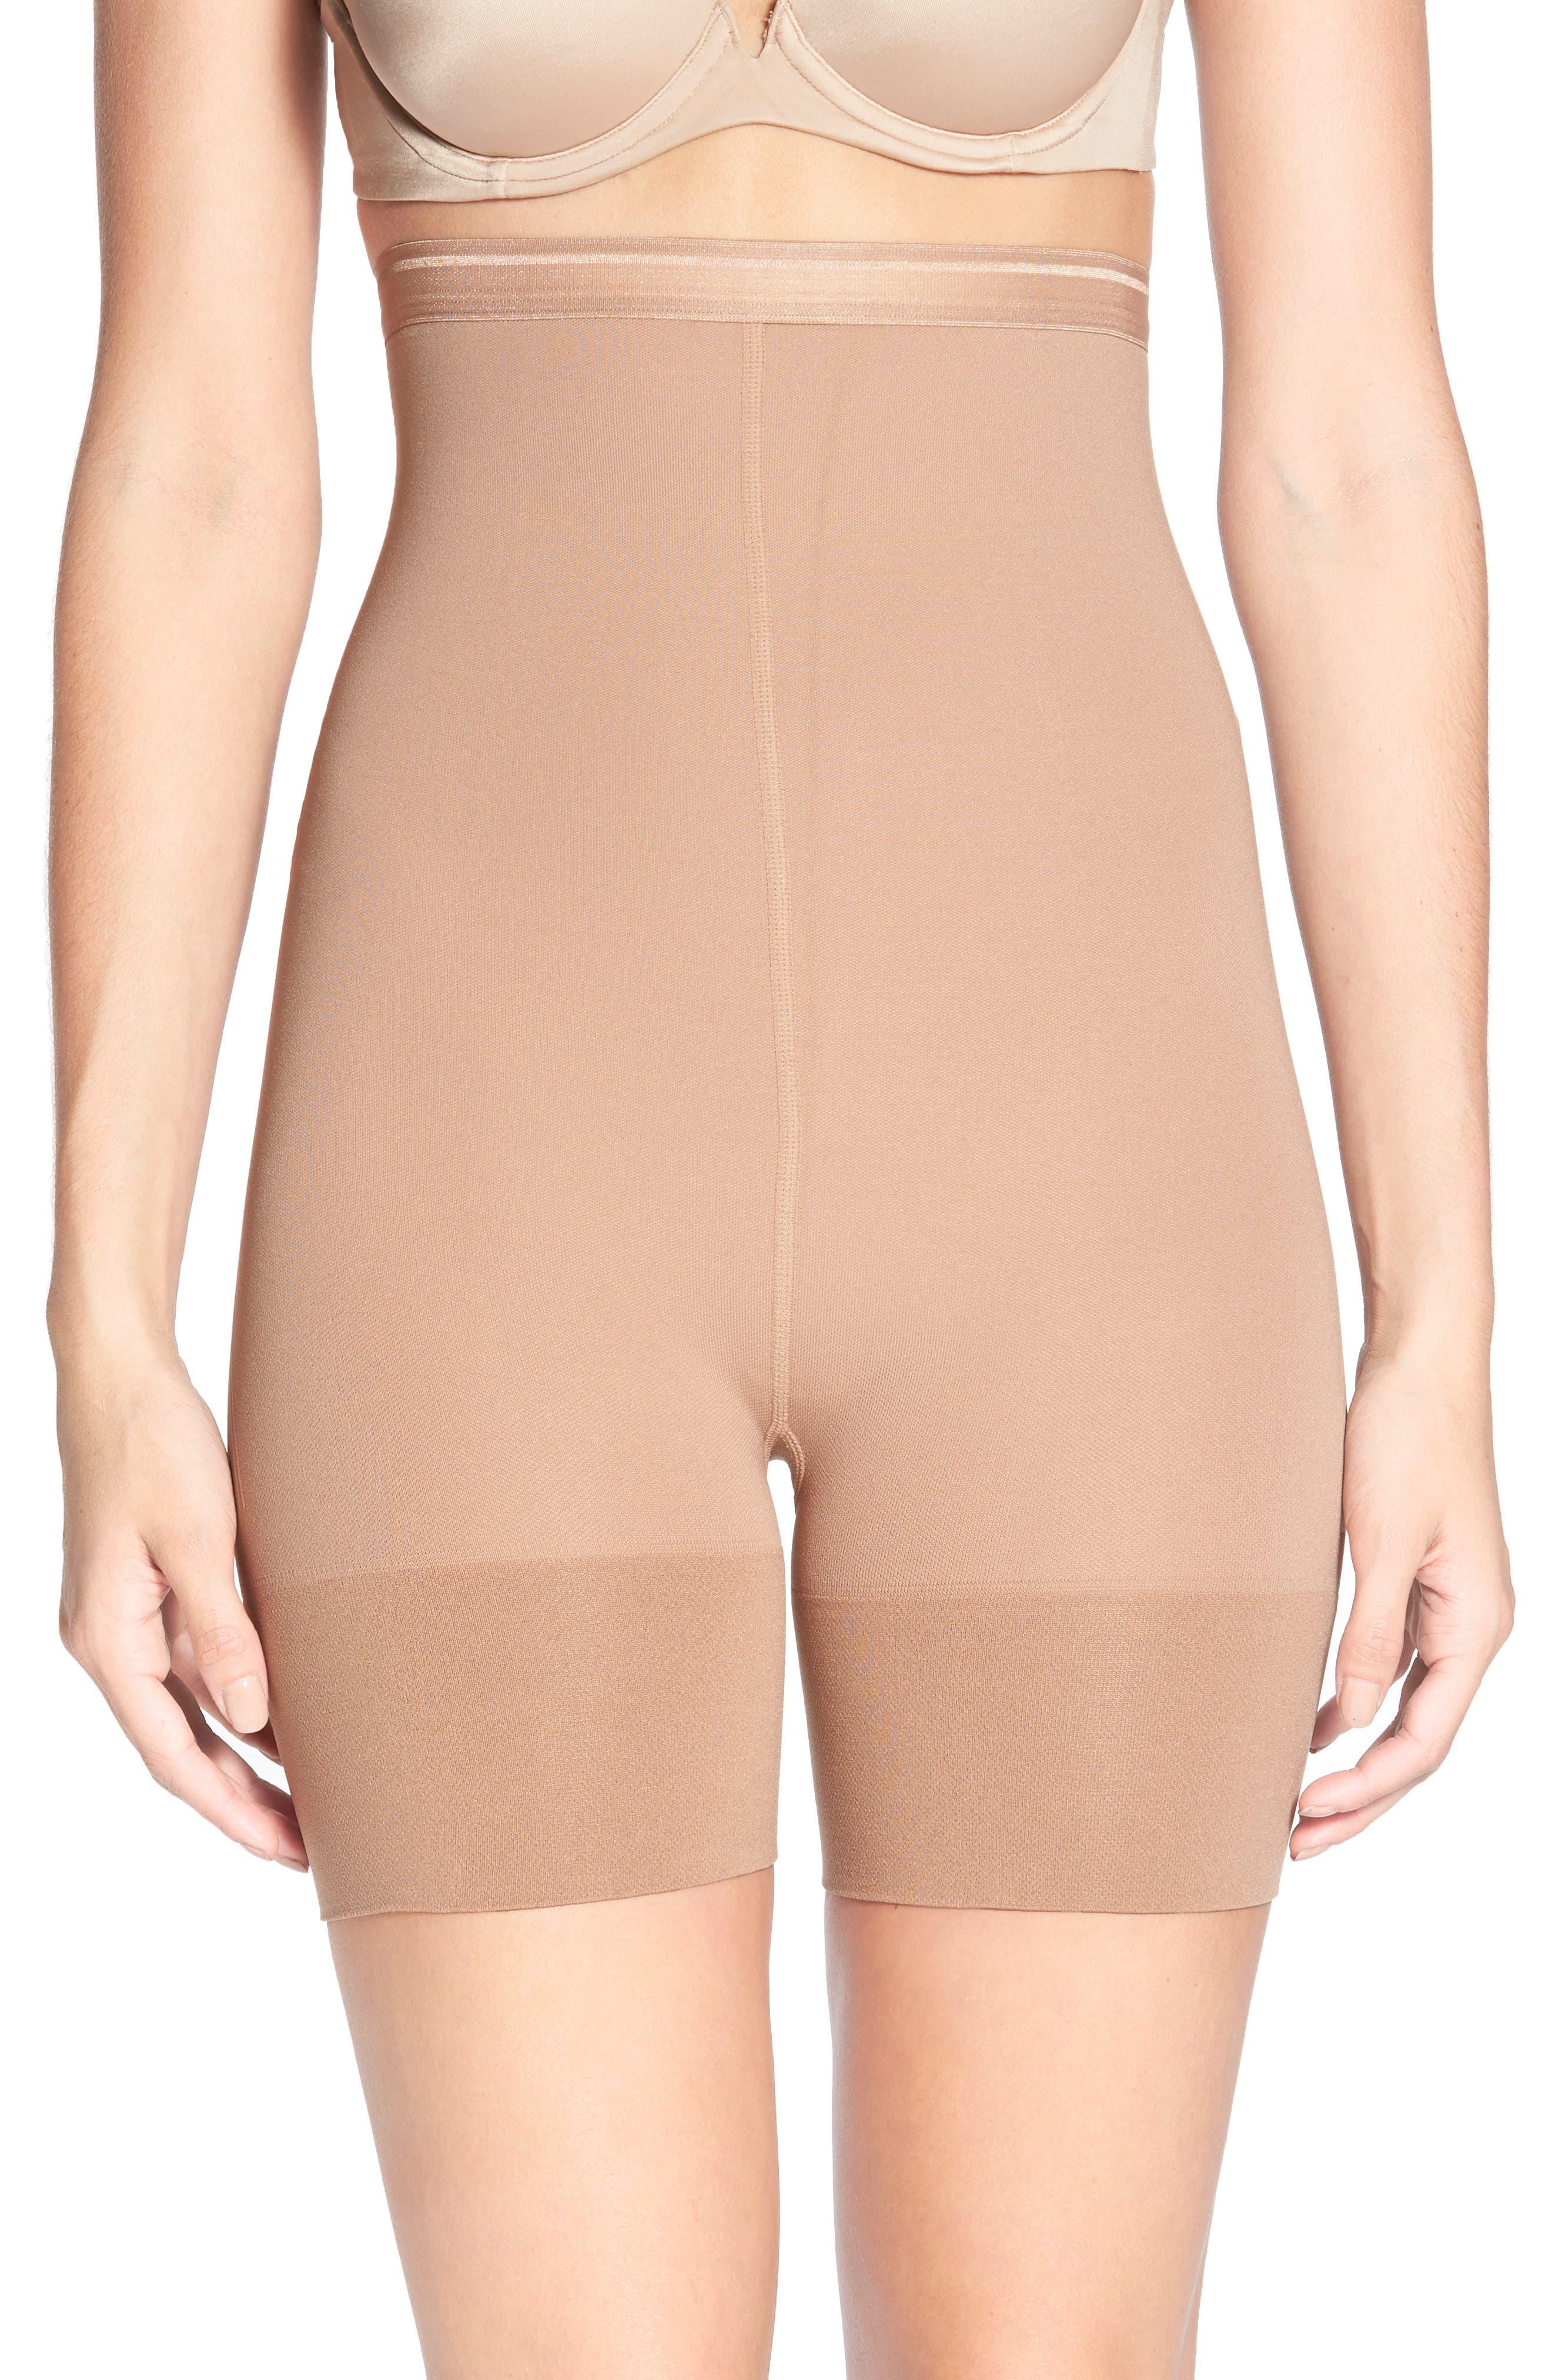 Main Image - ITEM m6 Shorty Shaping Shorts